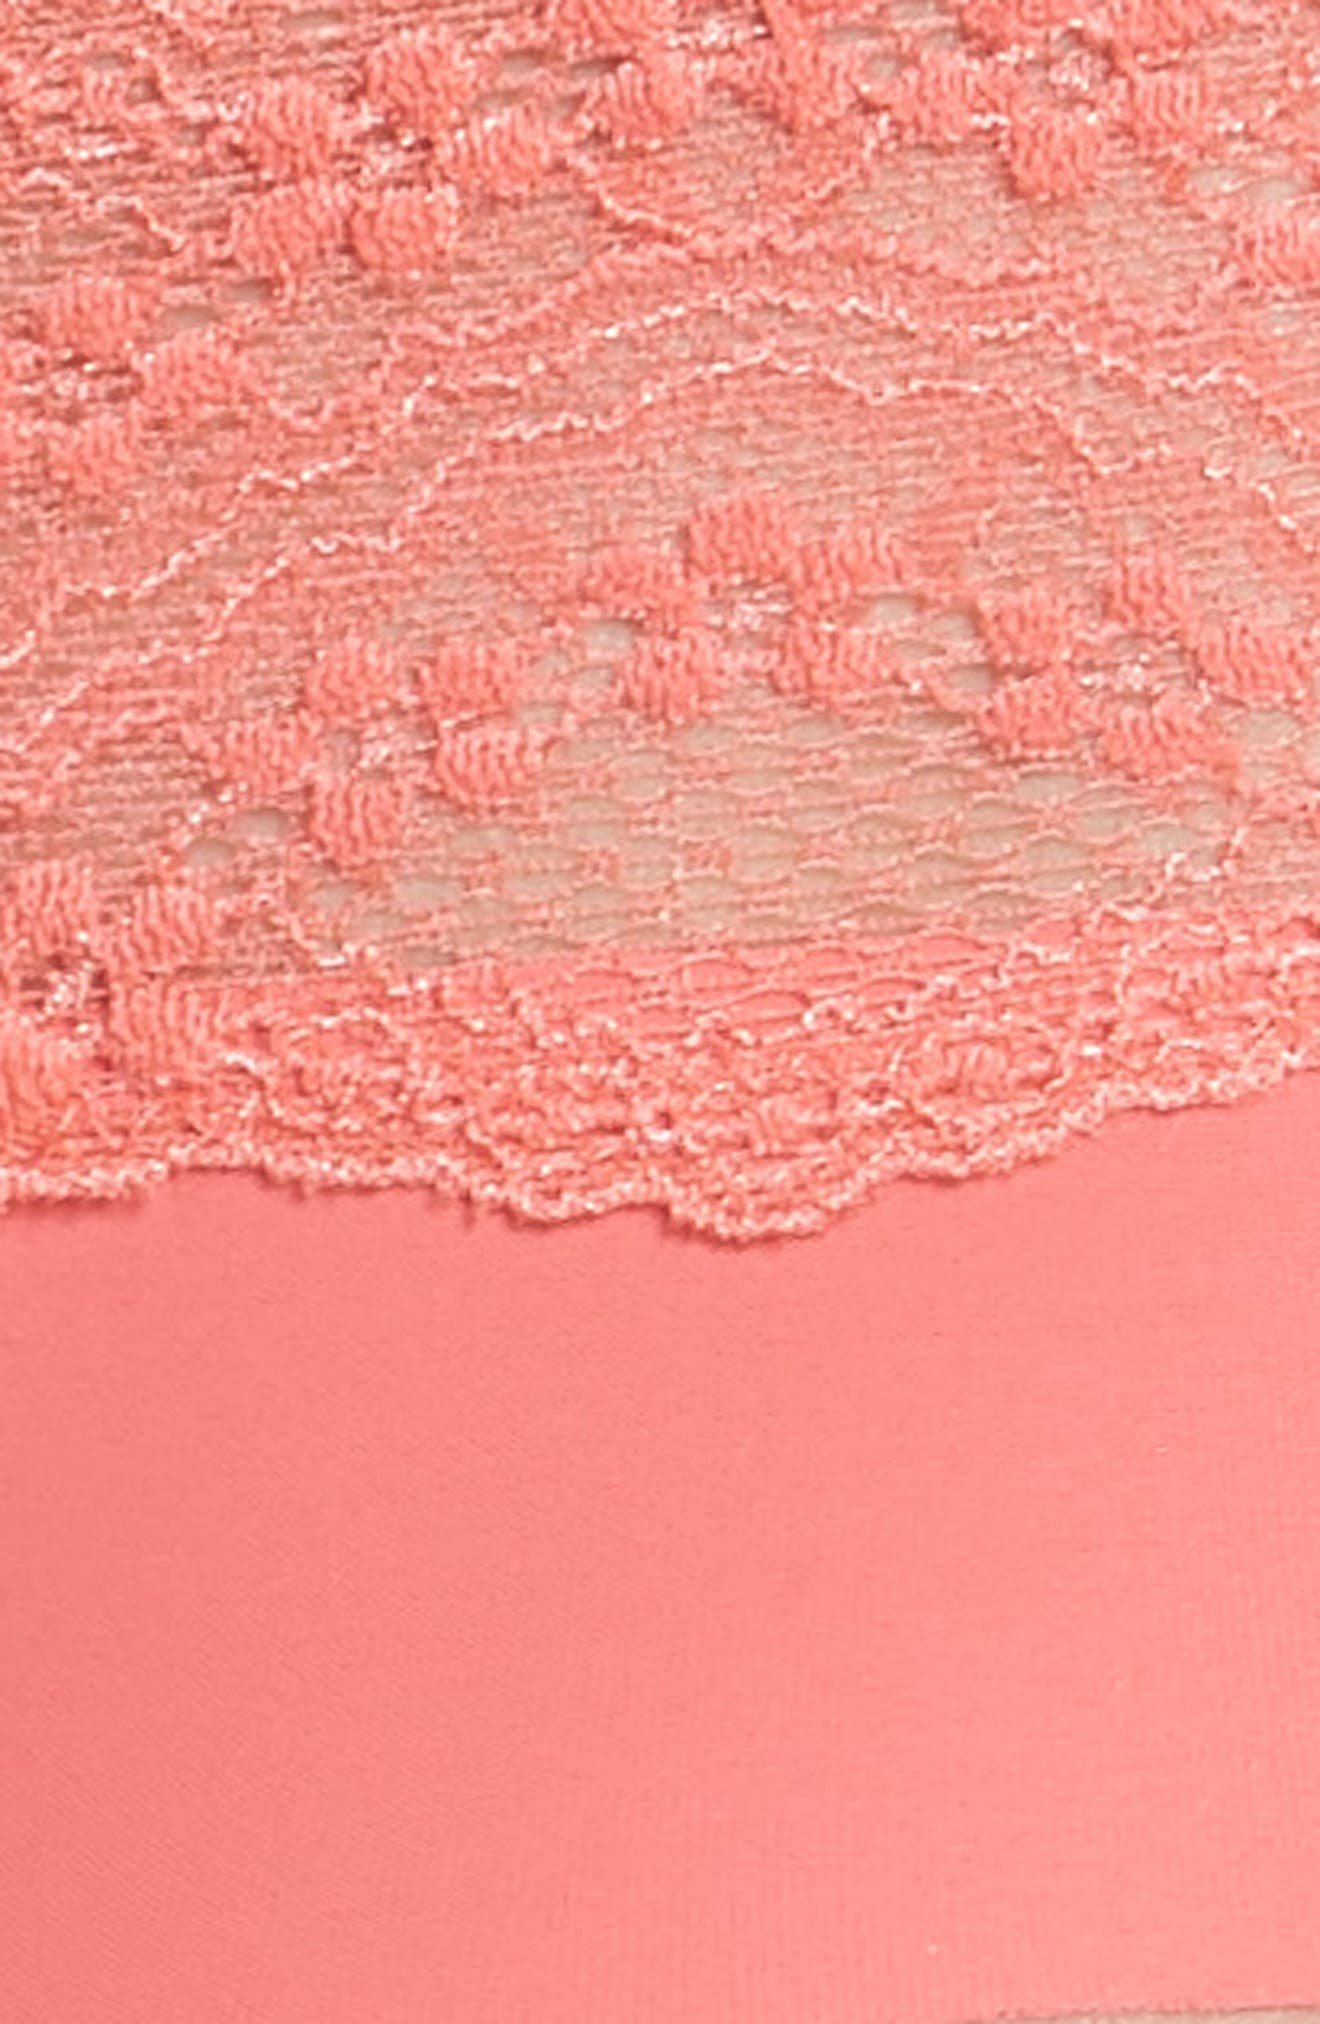 b.bare Hipster Panties,                             Alternate thumbnail 6, color,                             Calypso Coral